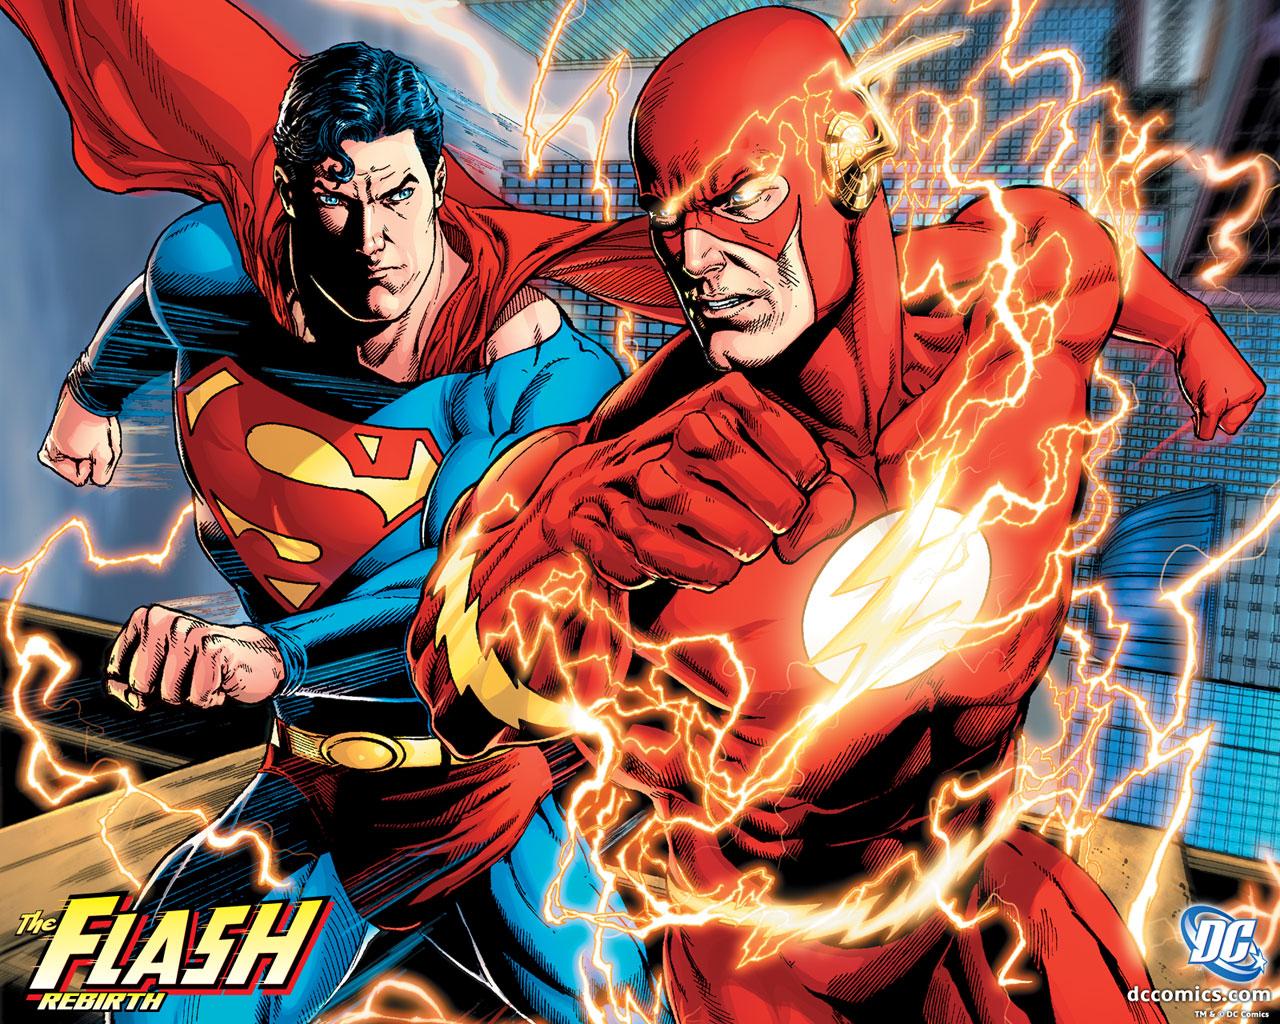 1280 The Flash Rebirth wallpaperjpg 1280x1024